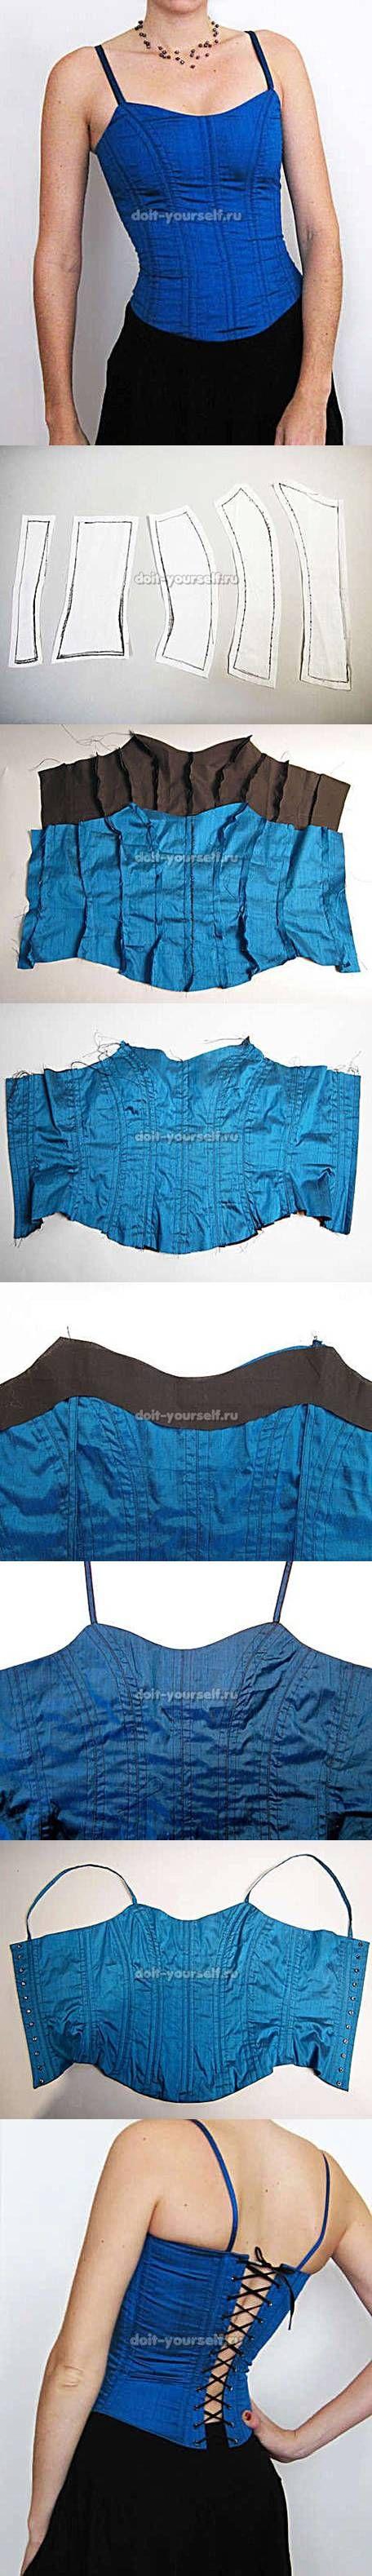 chrome hearts underwear DIY Stylish Tank Top